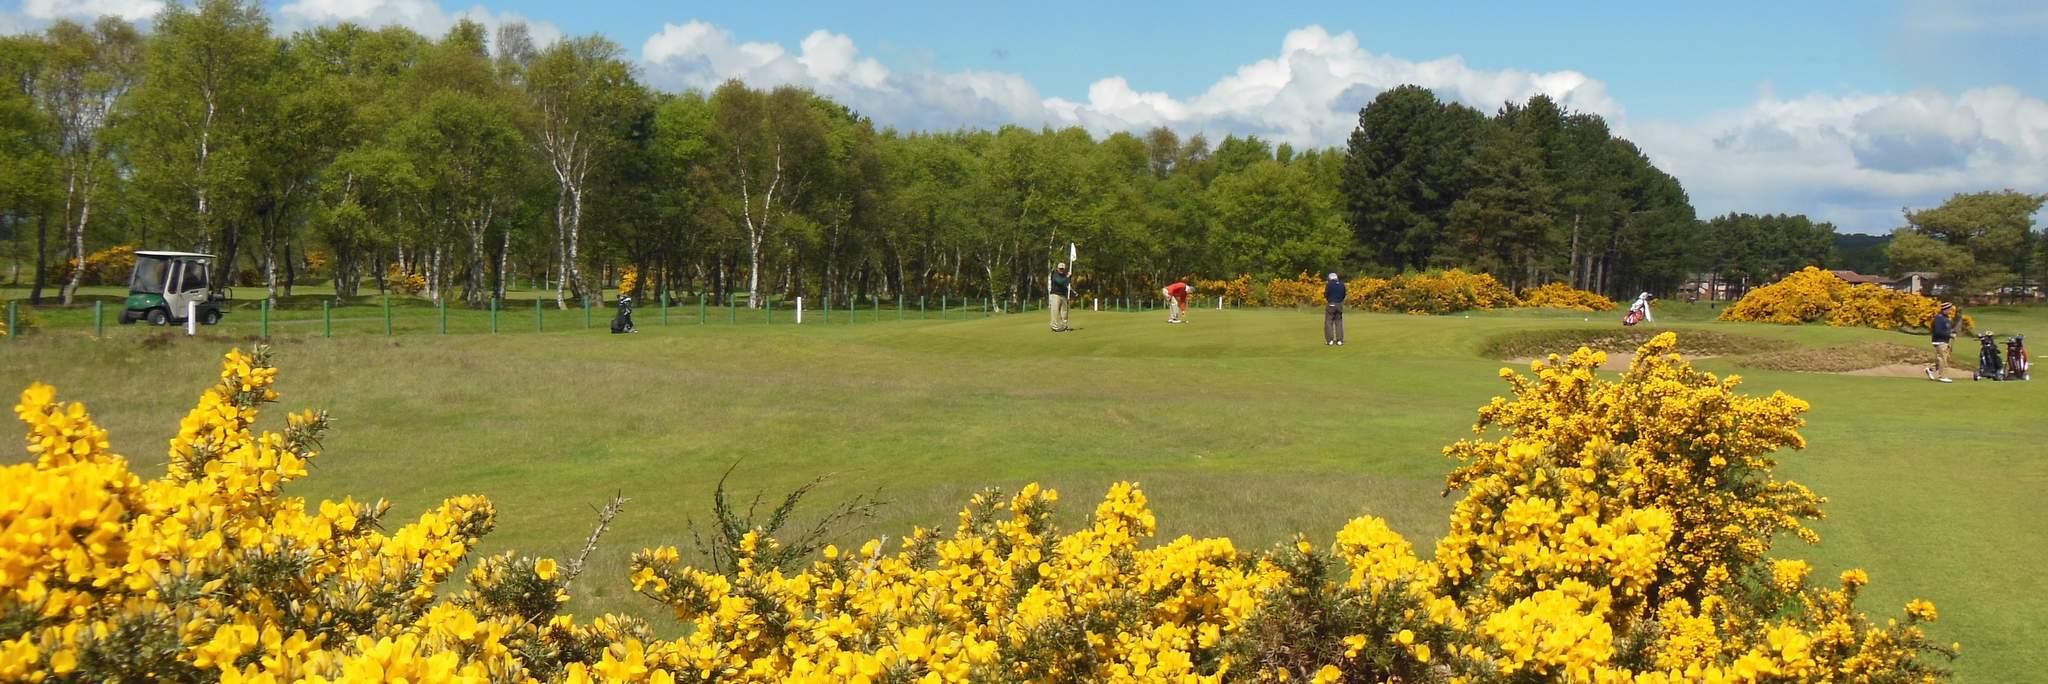 Golf in Edinburgh and The Lothians